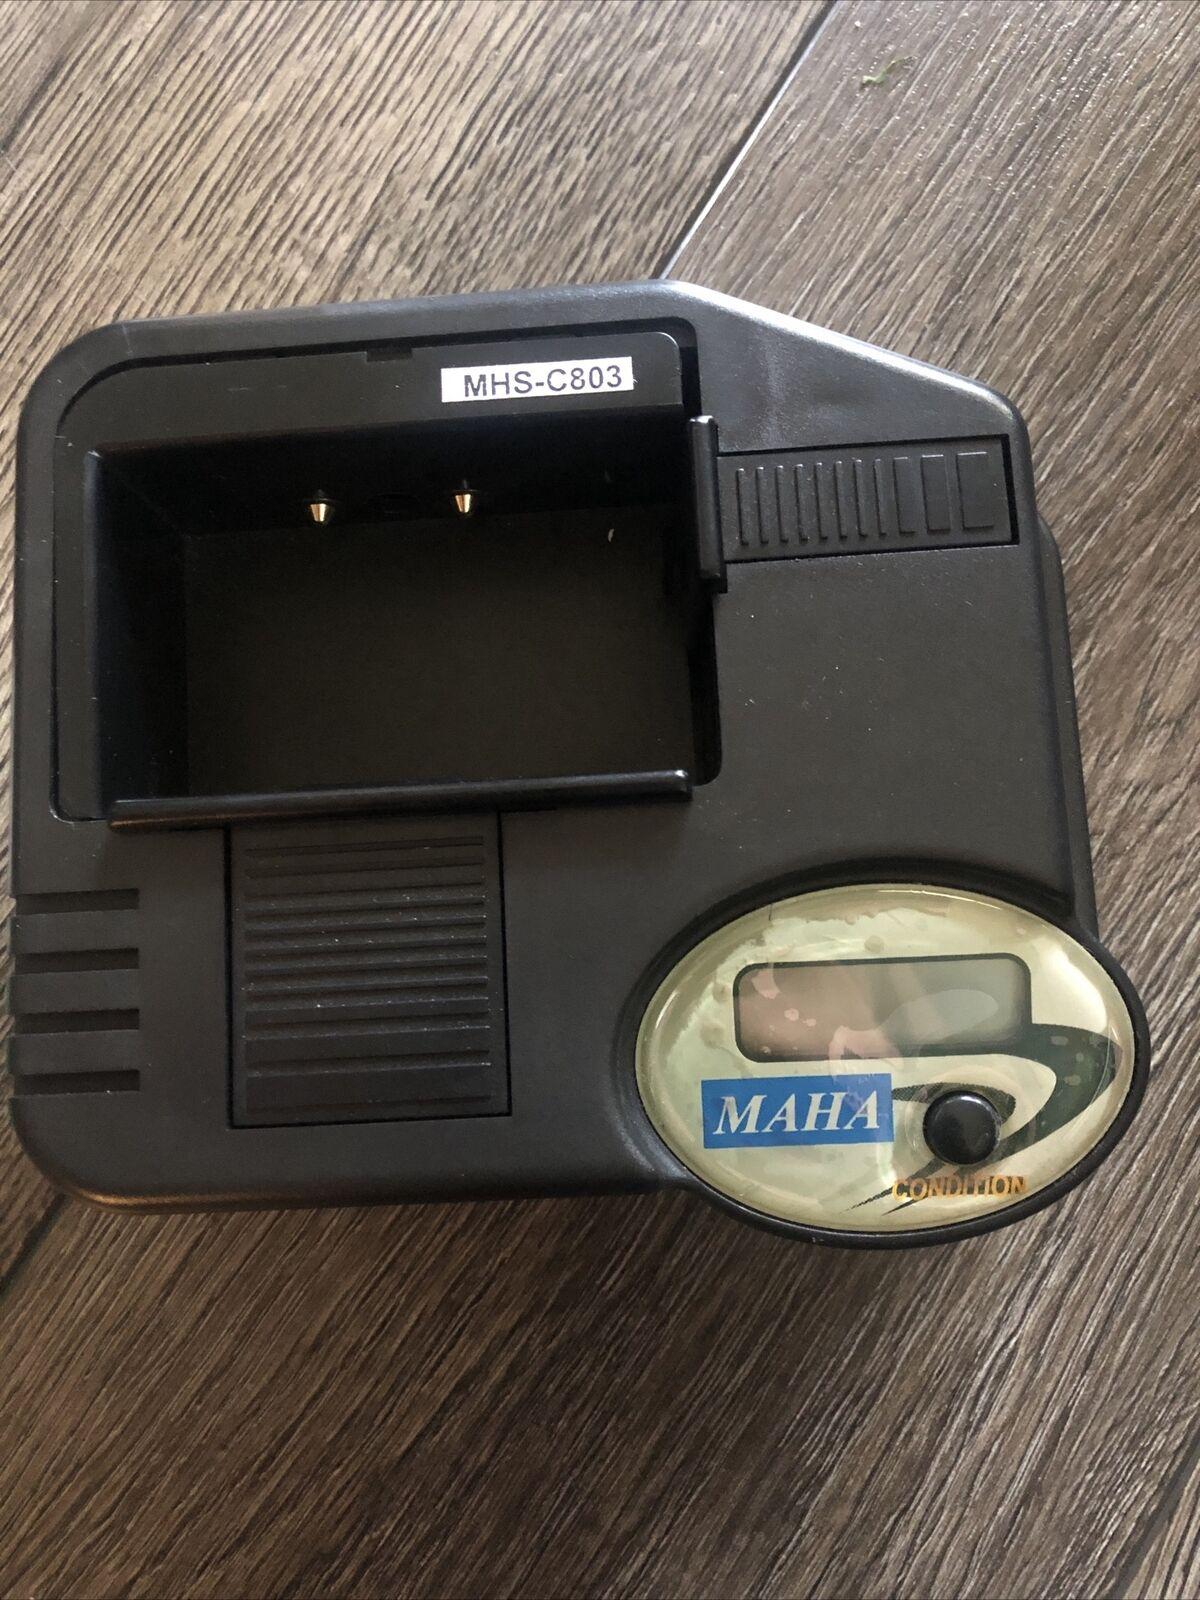 Maha MHS-C888 Universal Drop In Rapid Charger/Conditioner 2 Way Radio Batteries